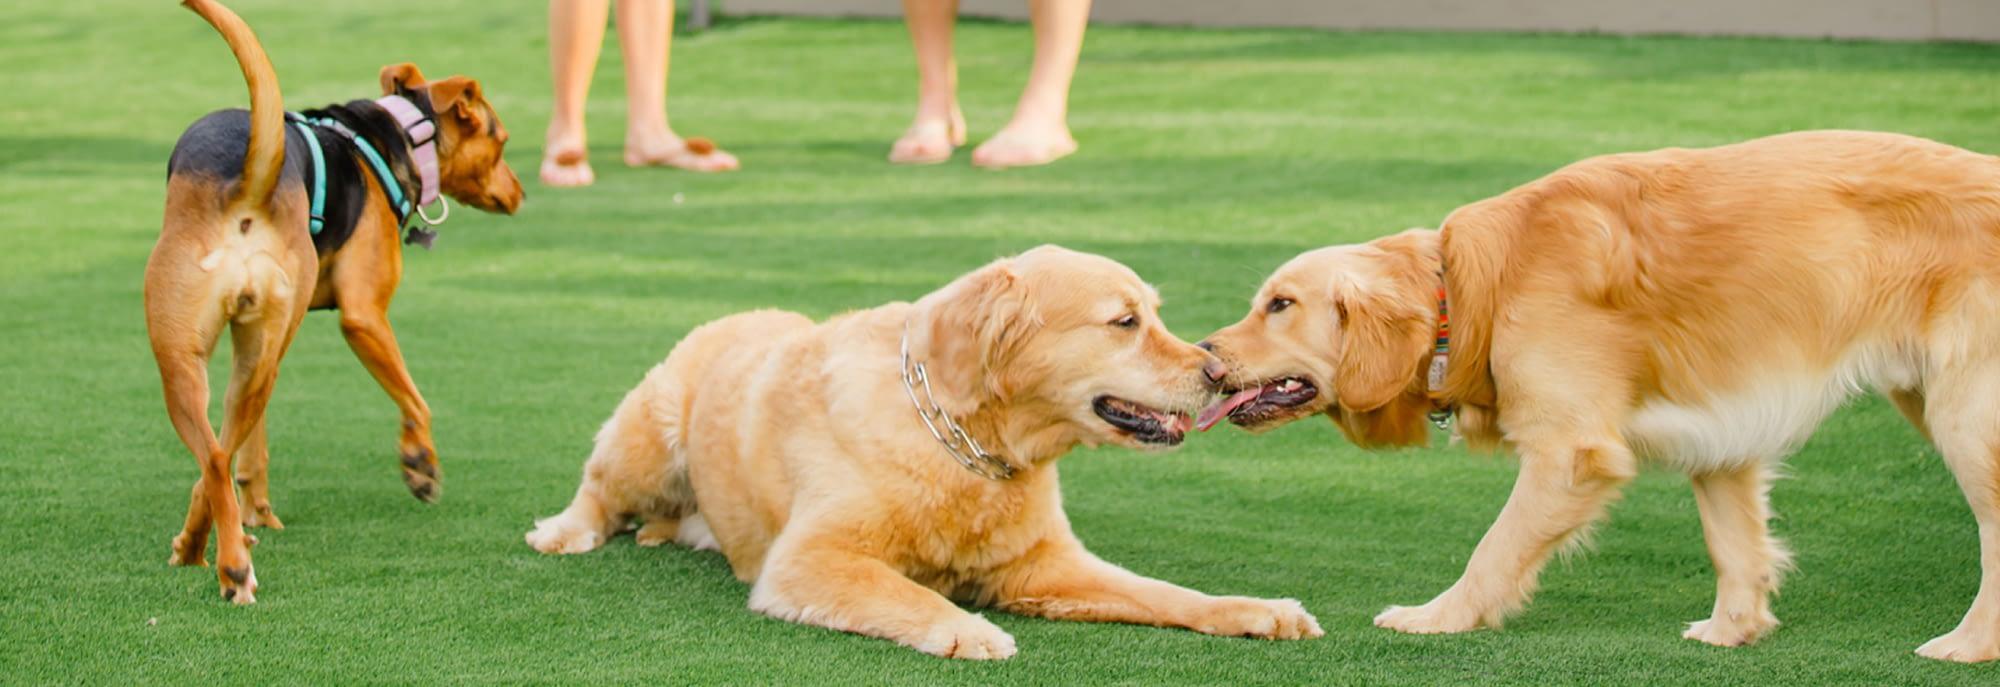 charlotte dog daycare